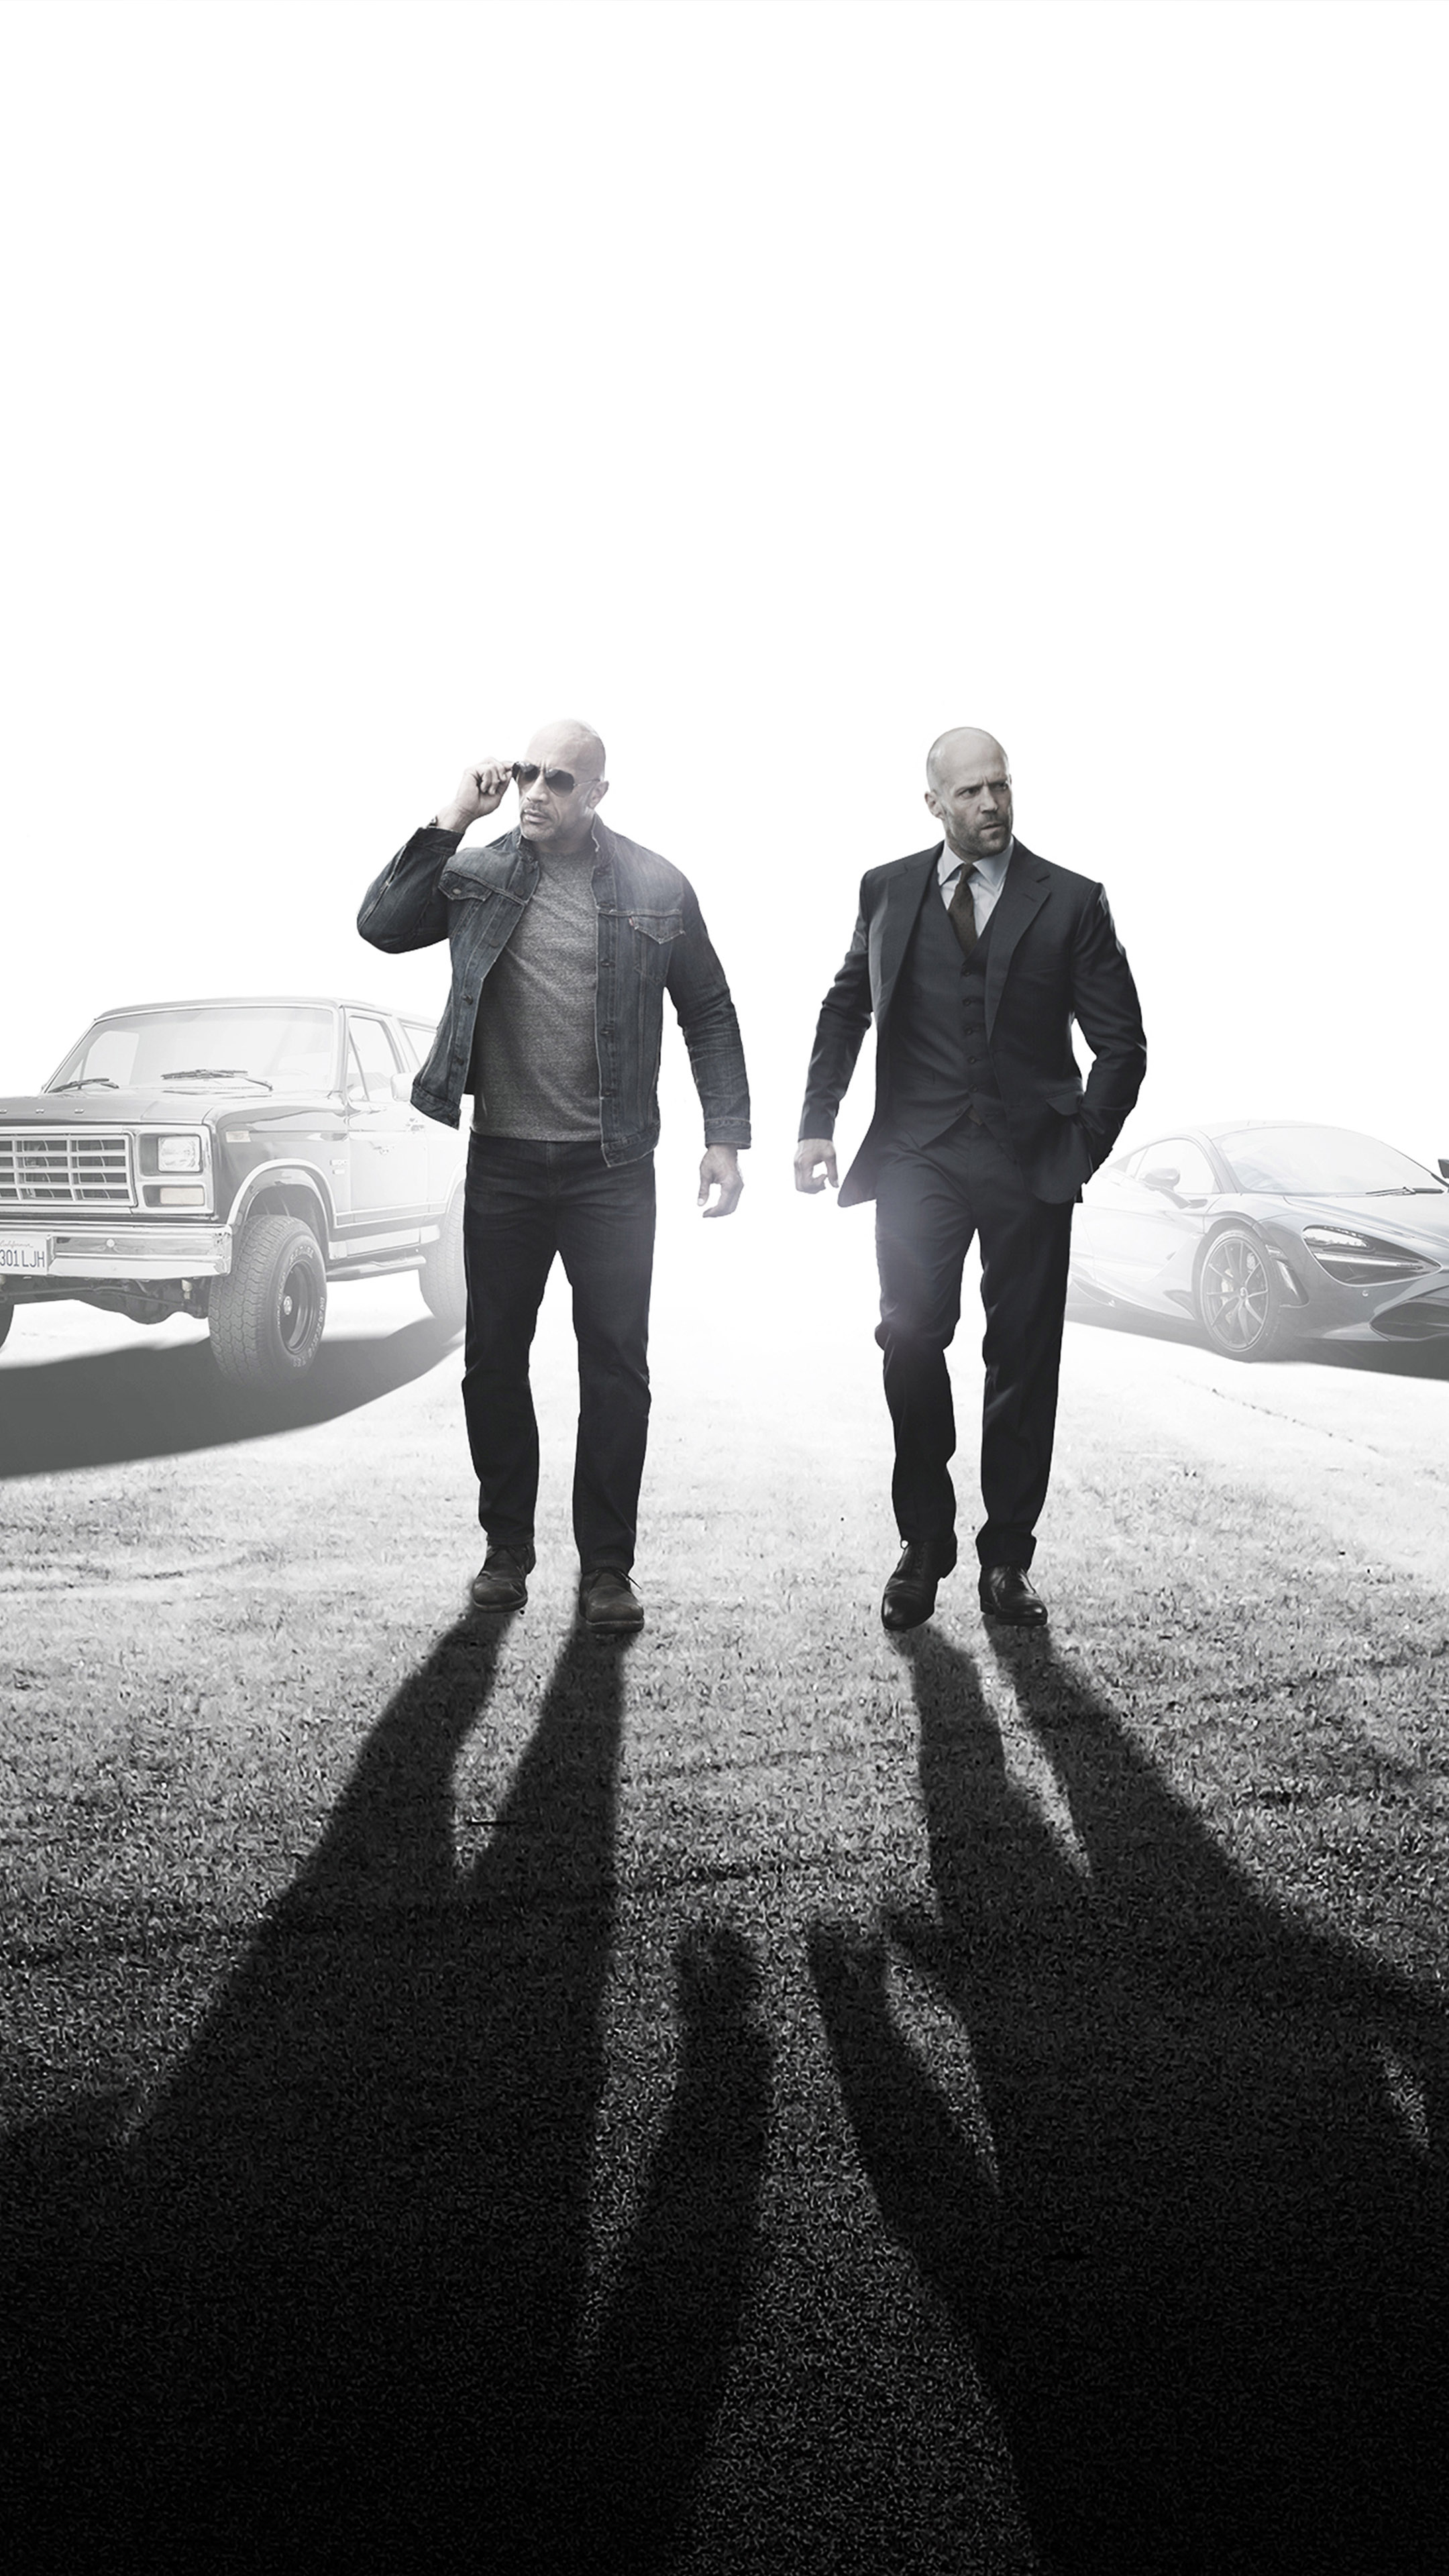 Dwayne Johnson Jason In Fast Furious Presents Hobbs Shaw 4k Ultra Hd Mobile Wallpaper